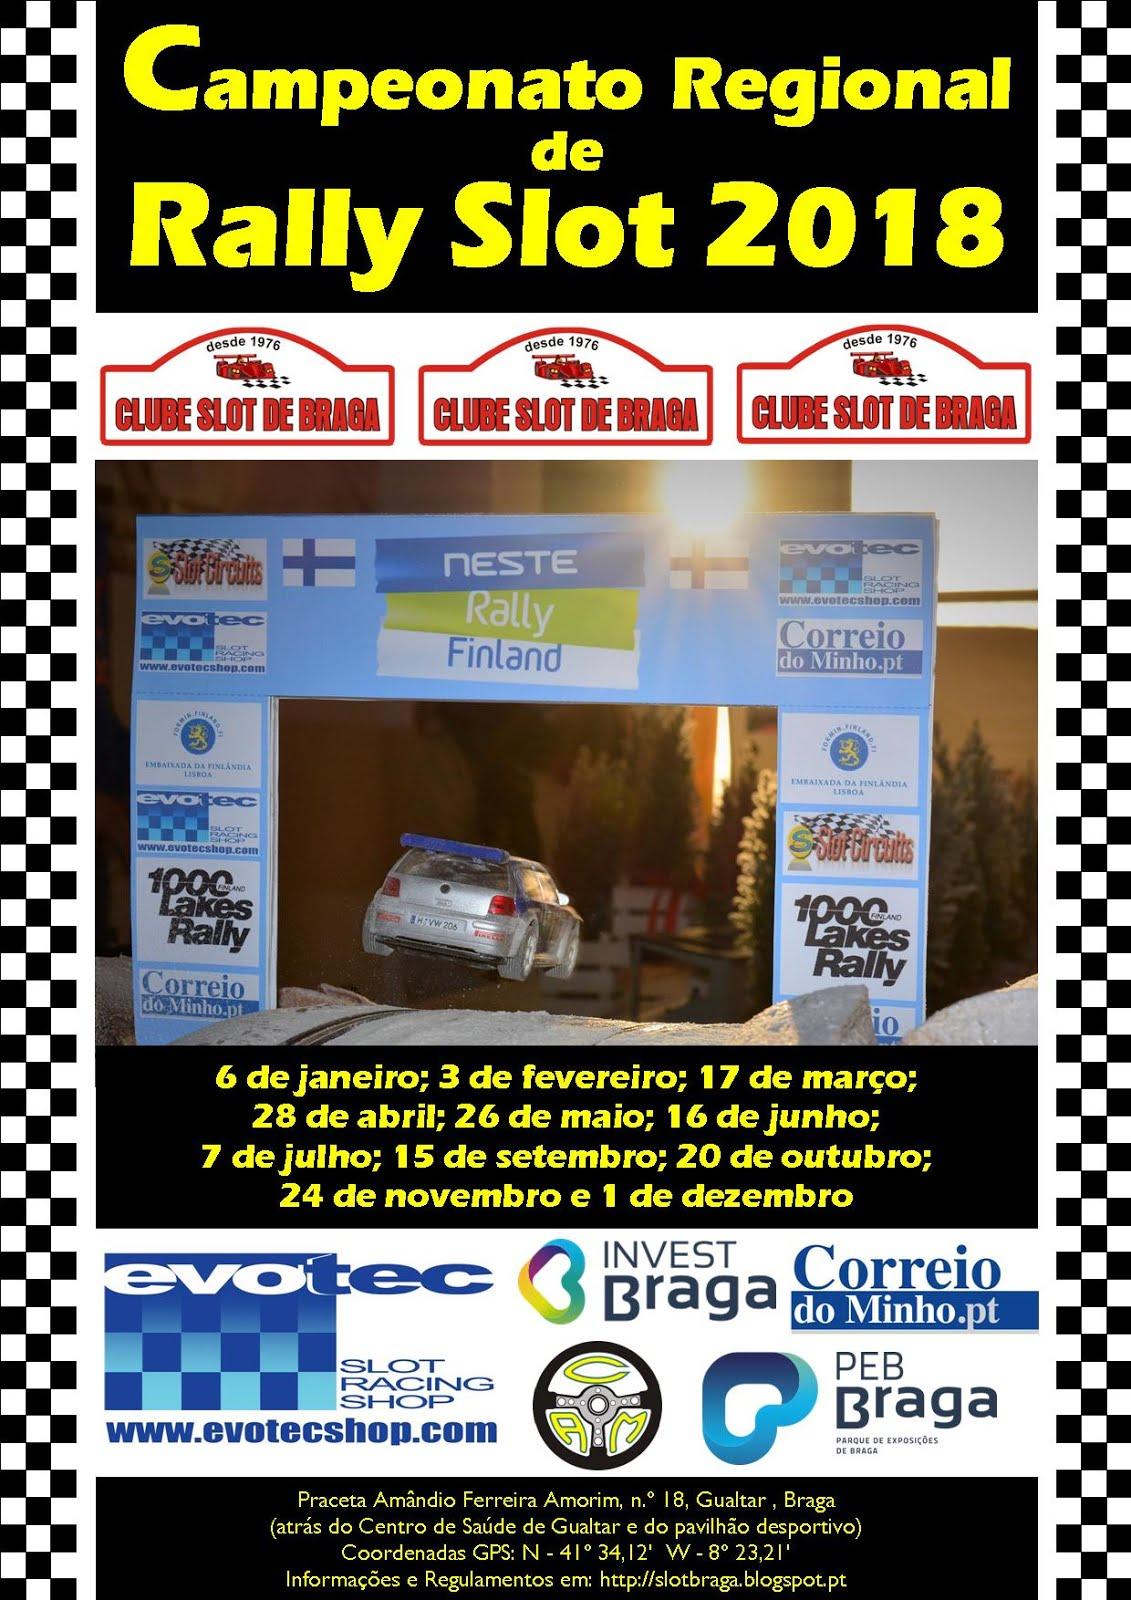 Campeonato Regional de Rally Slot 2018